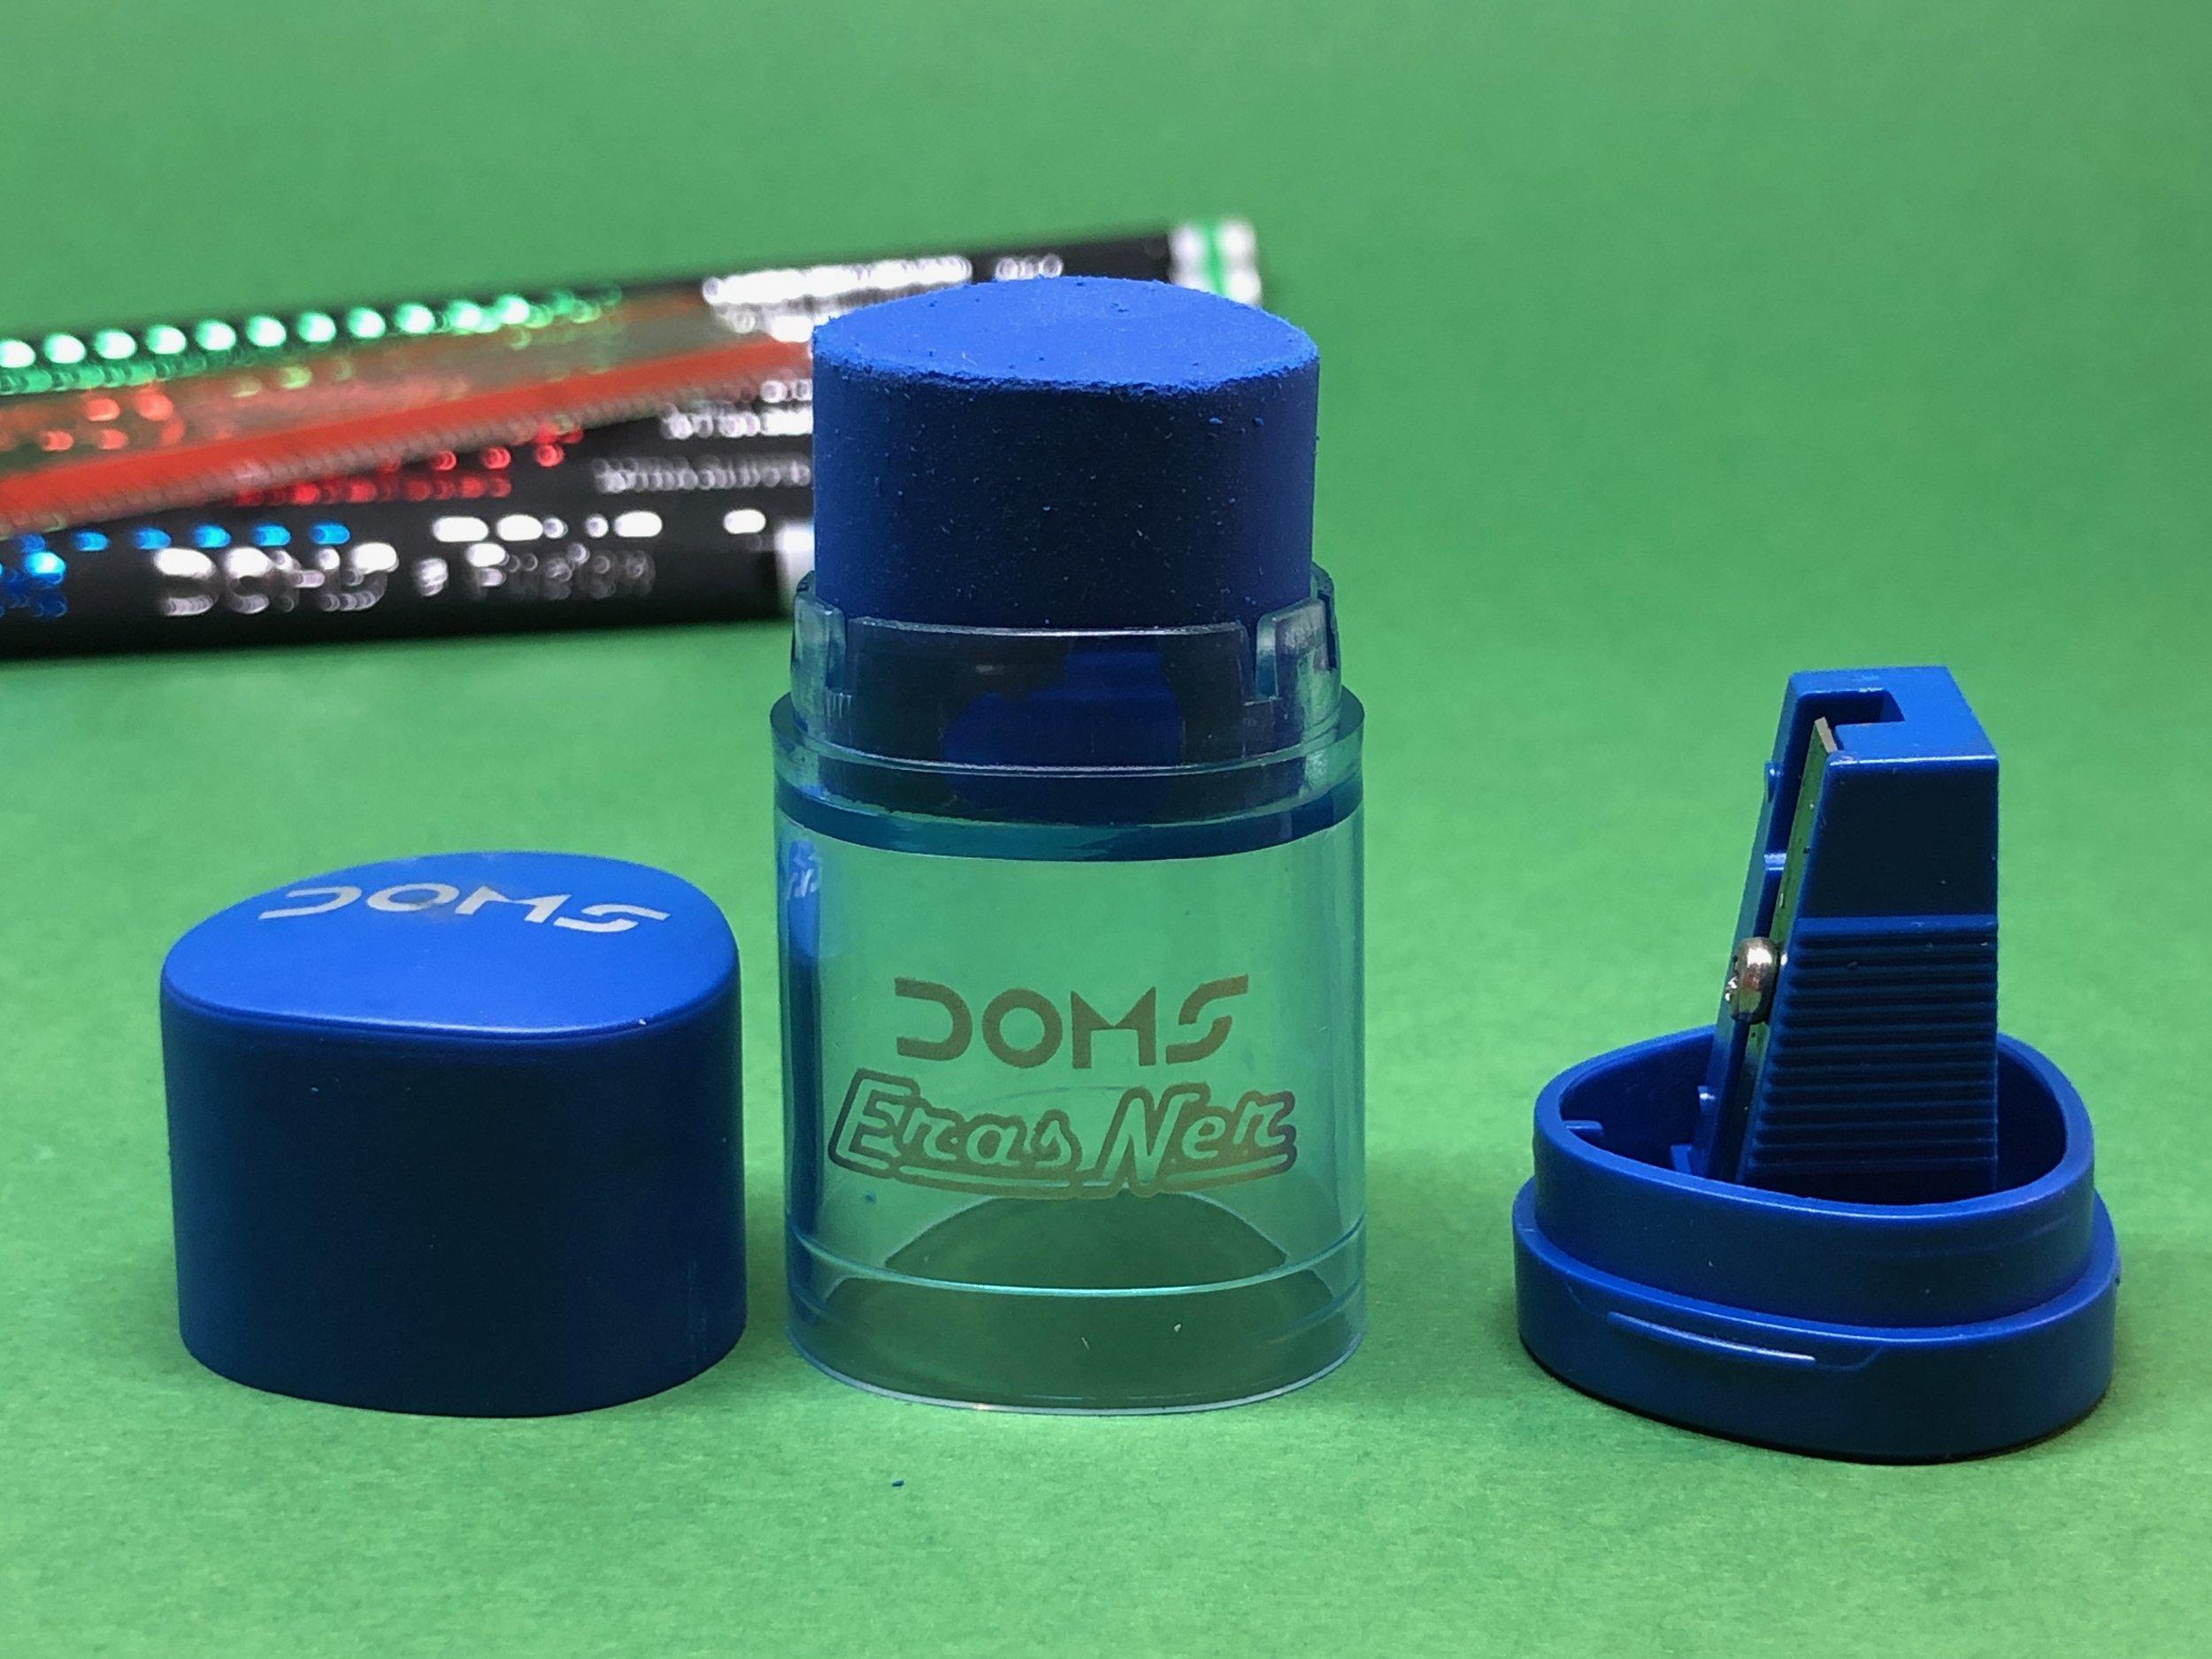 doms-fusion-pencil-8.jpg